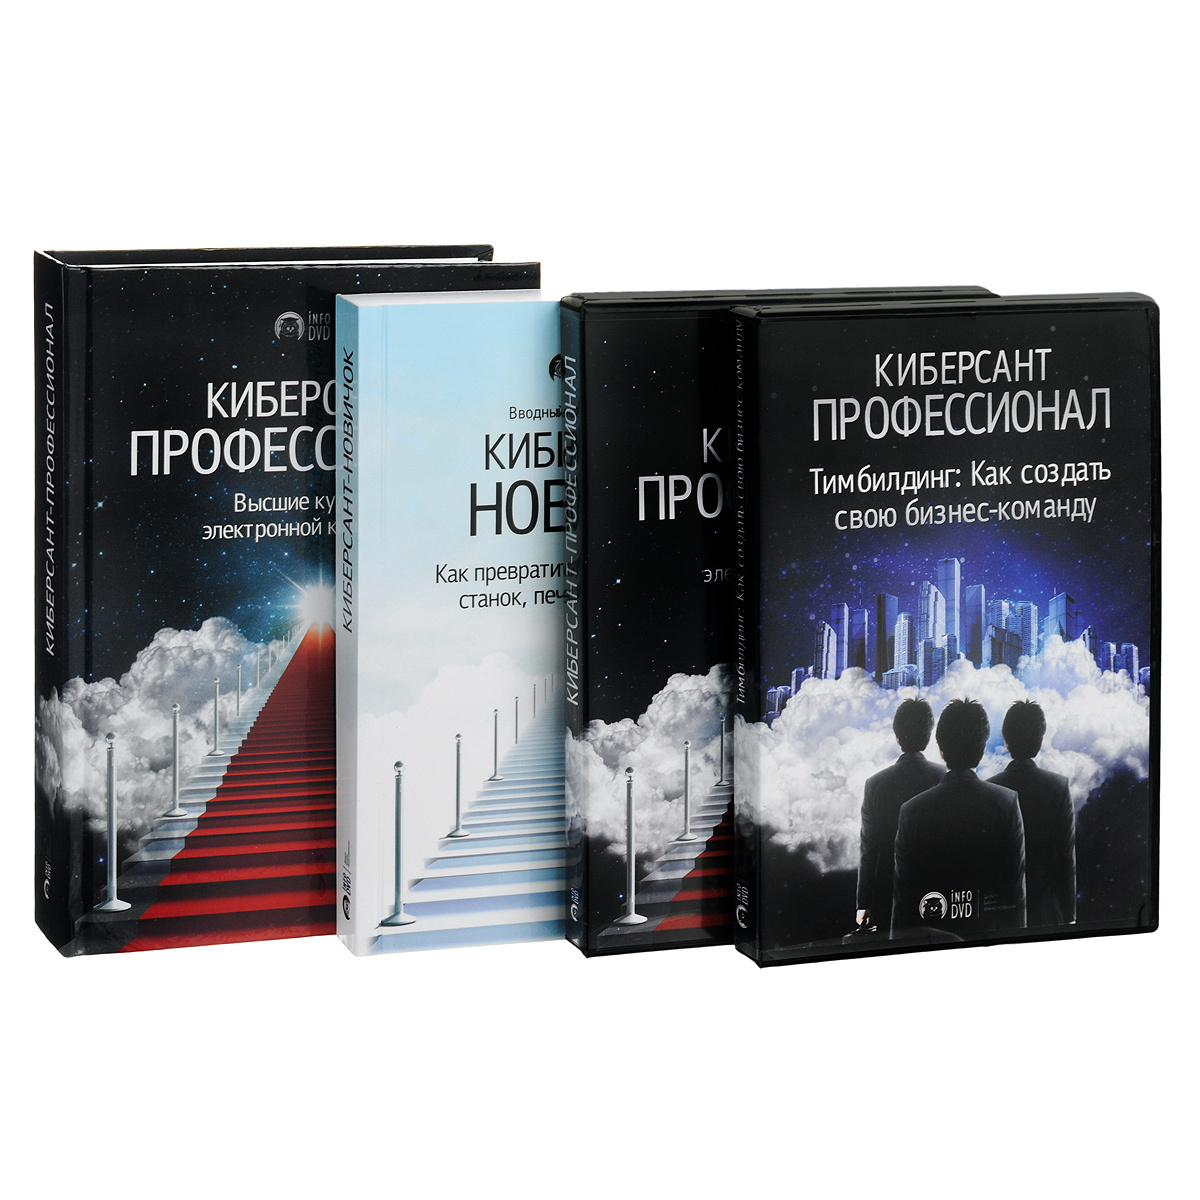 Киберсант-Профессионал (3 DVD + комплект из 2 книг) #1